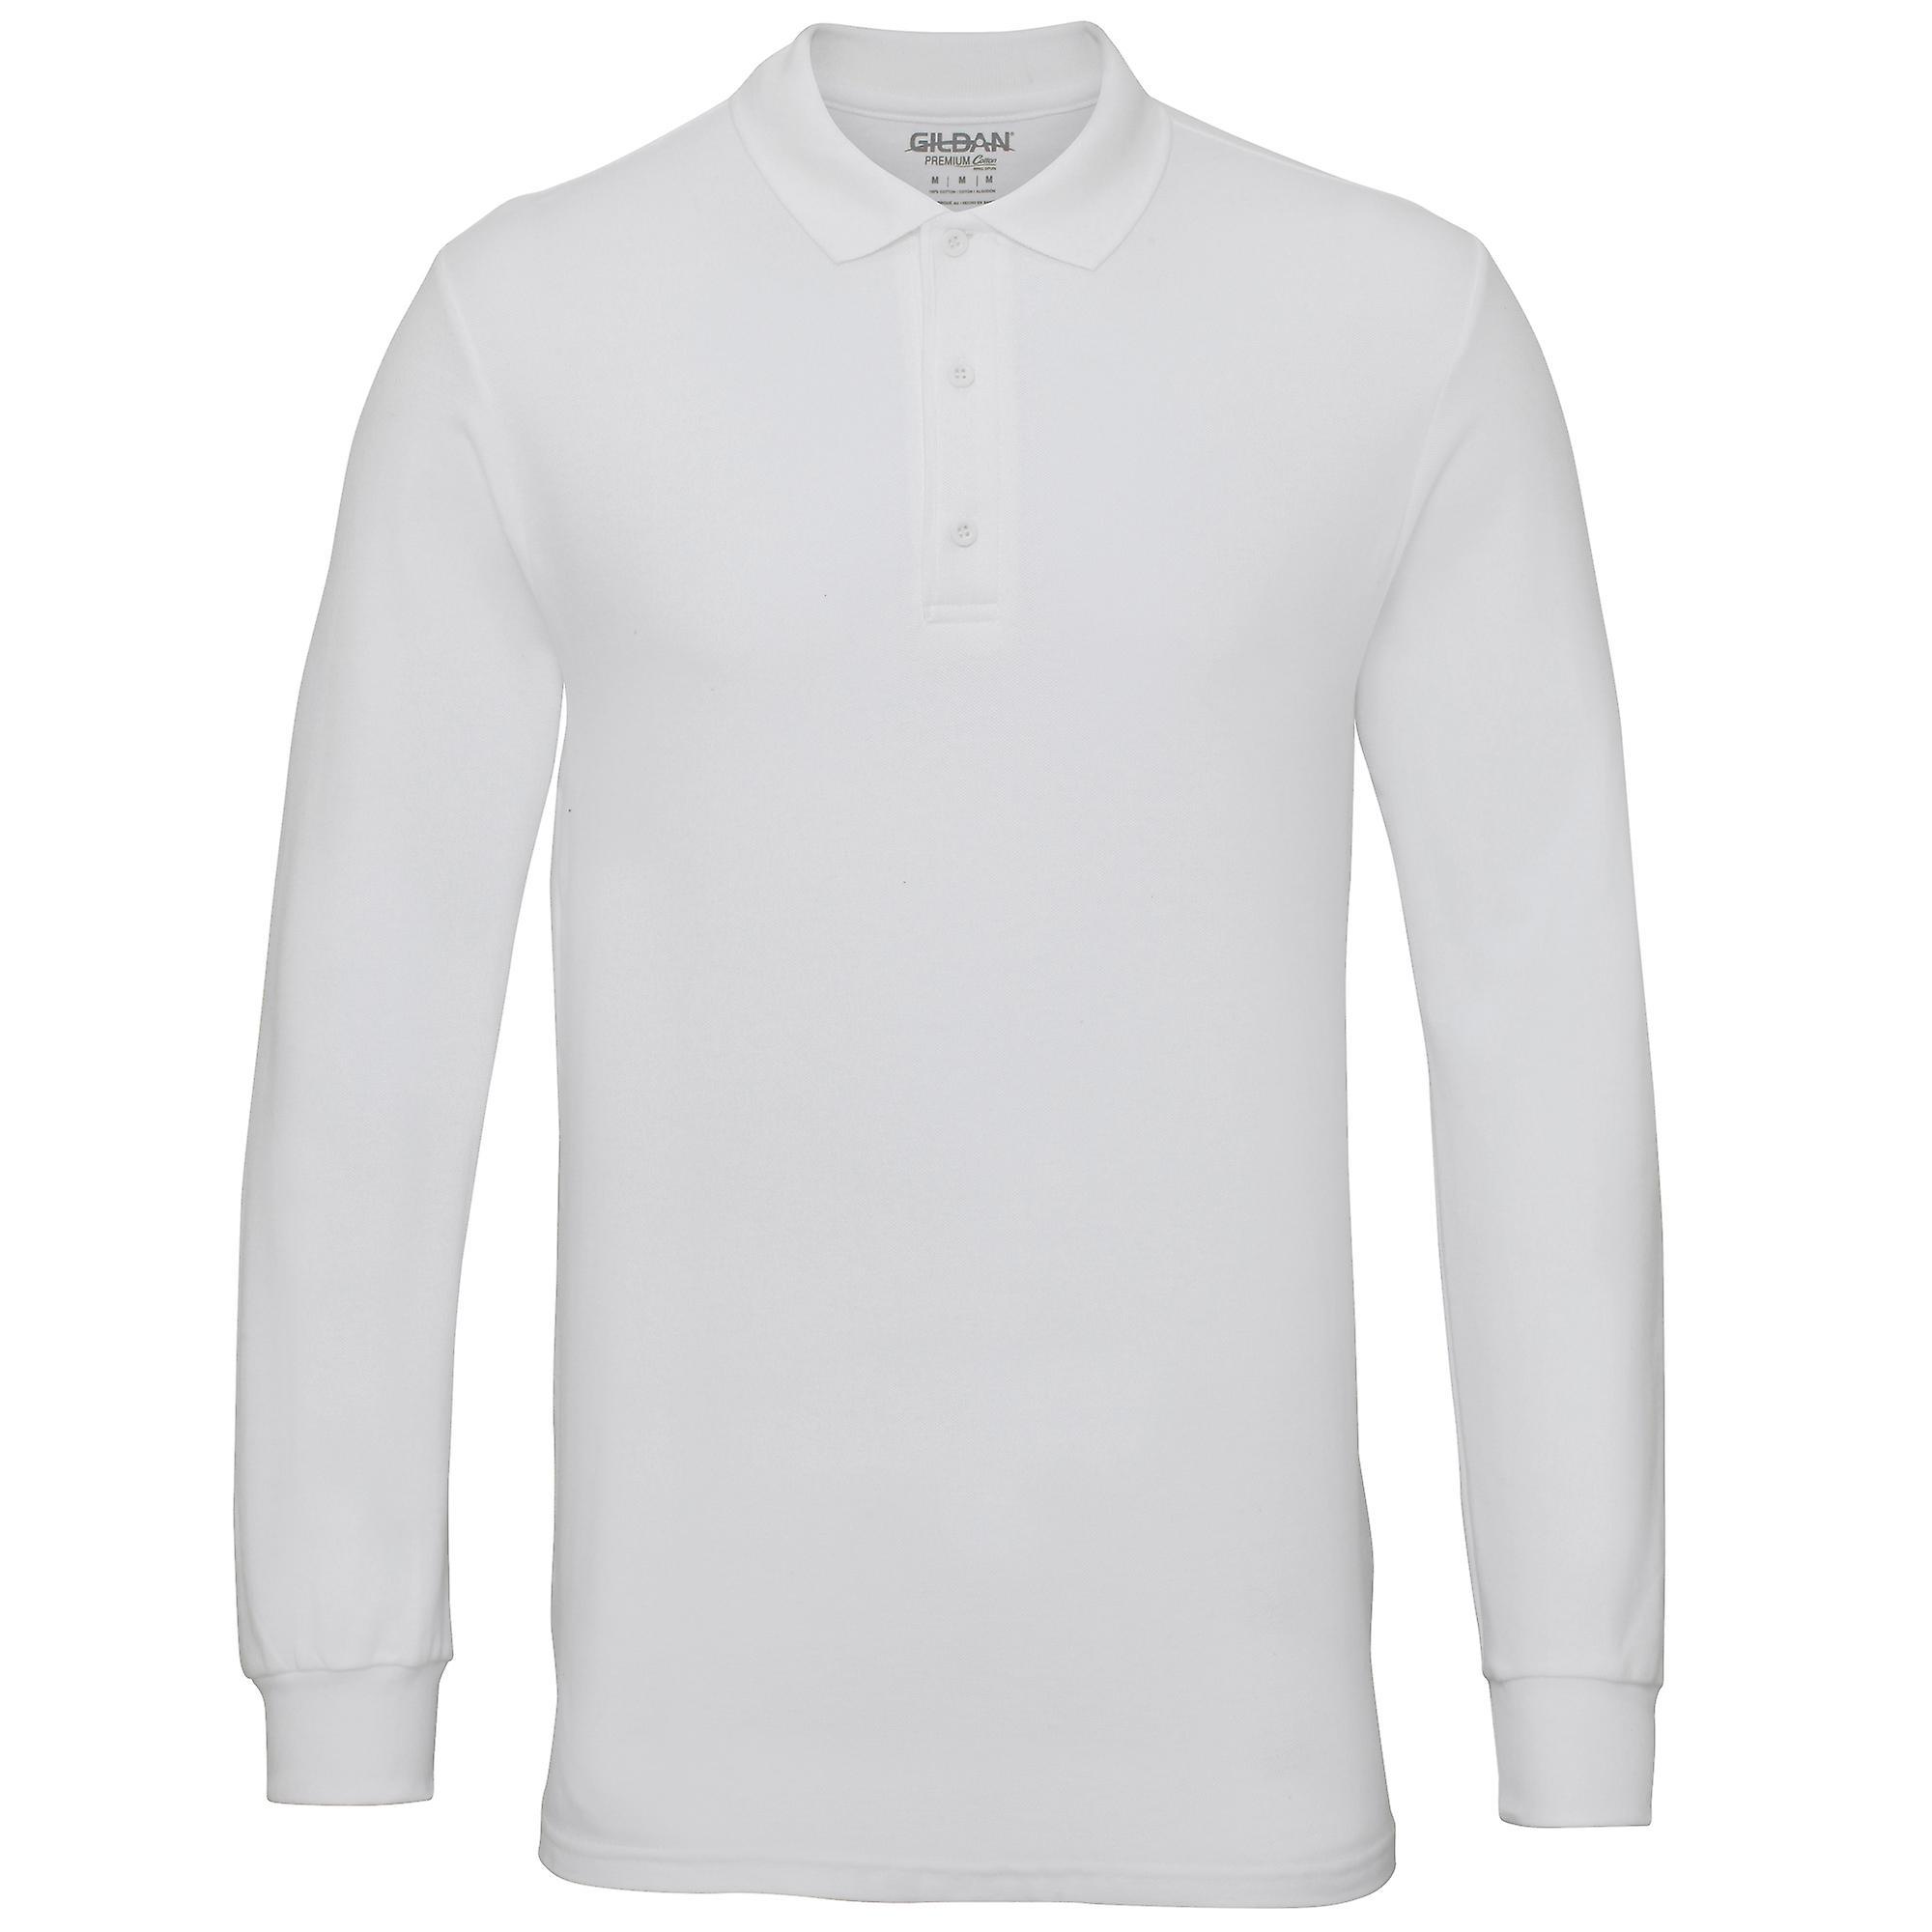 619eef35a270 Gildan Herren Langarm Doppel Pique Baumwolle Polo-Shirt   Fruugo